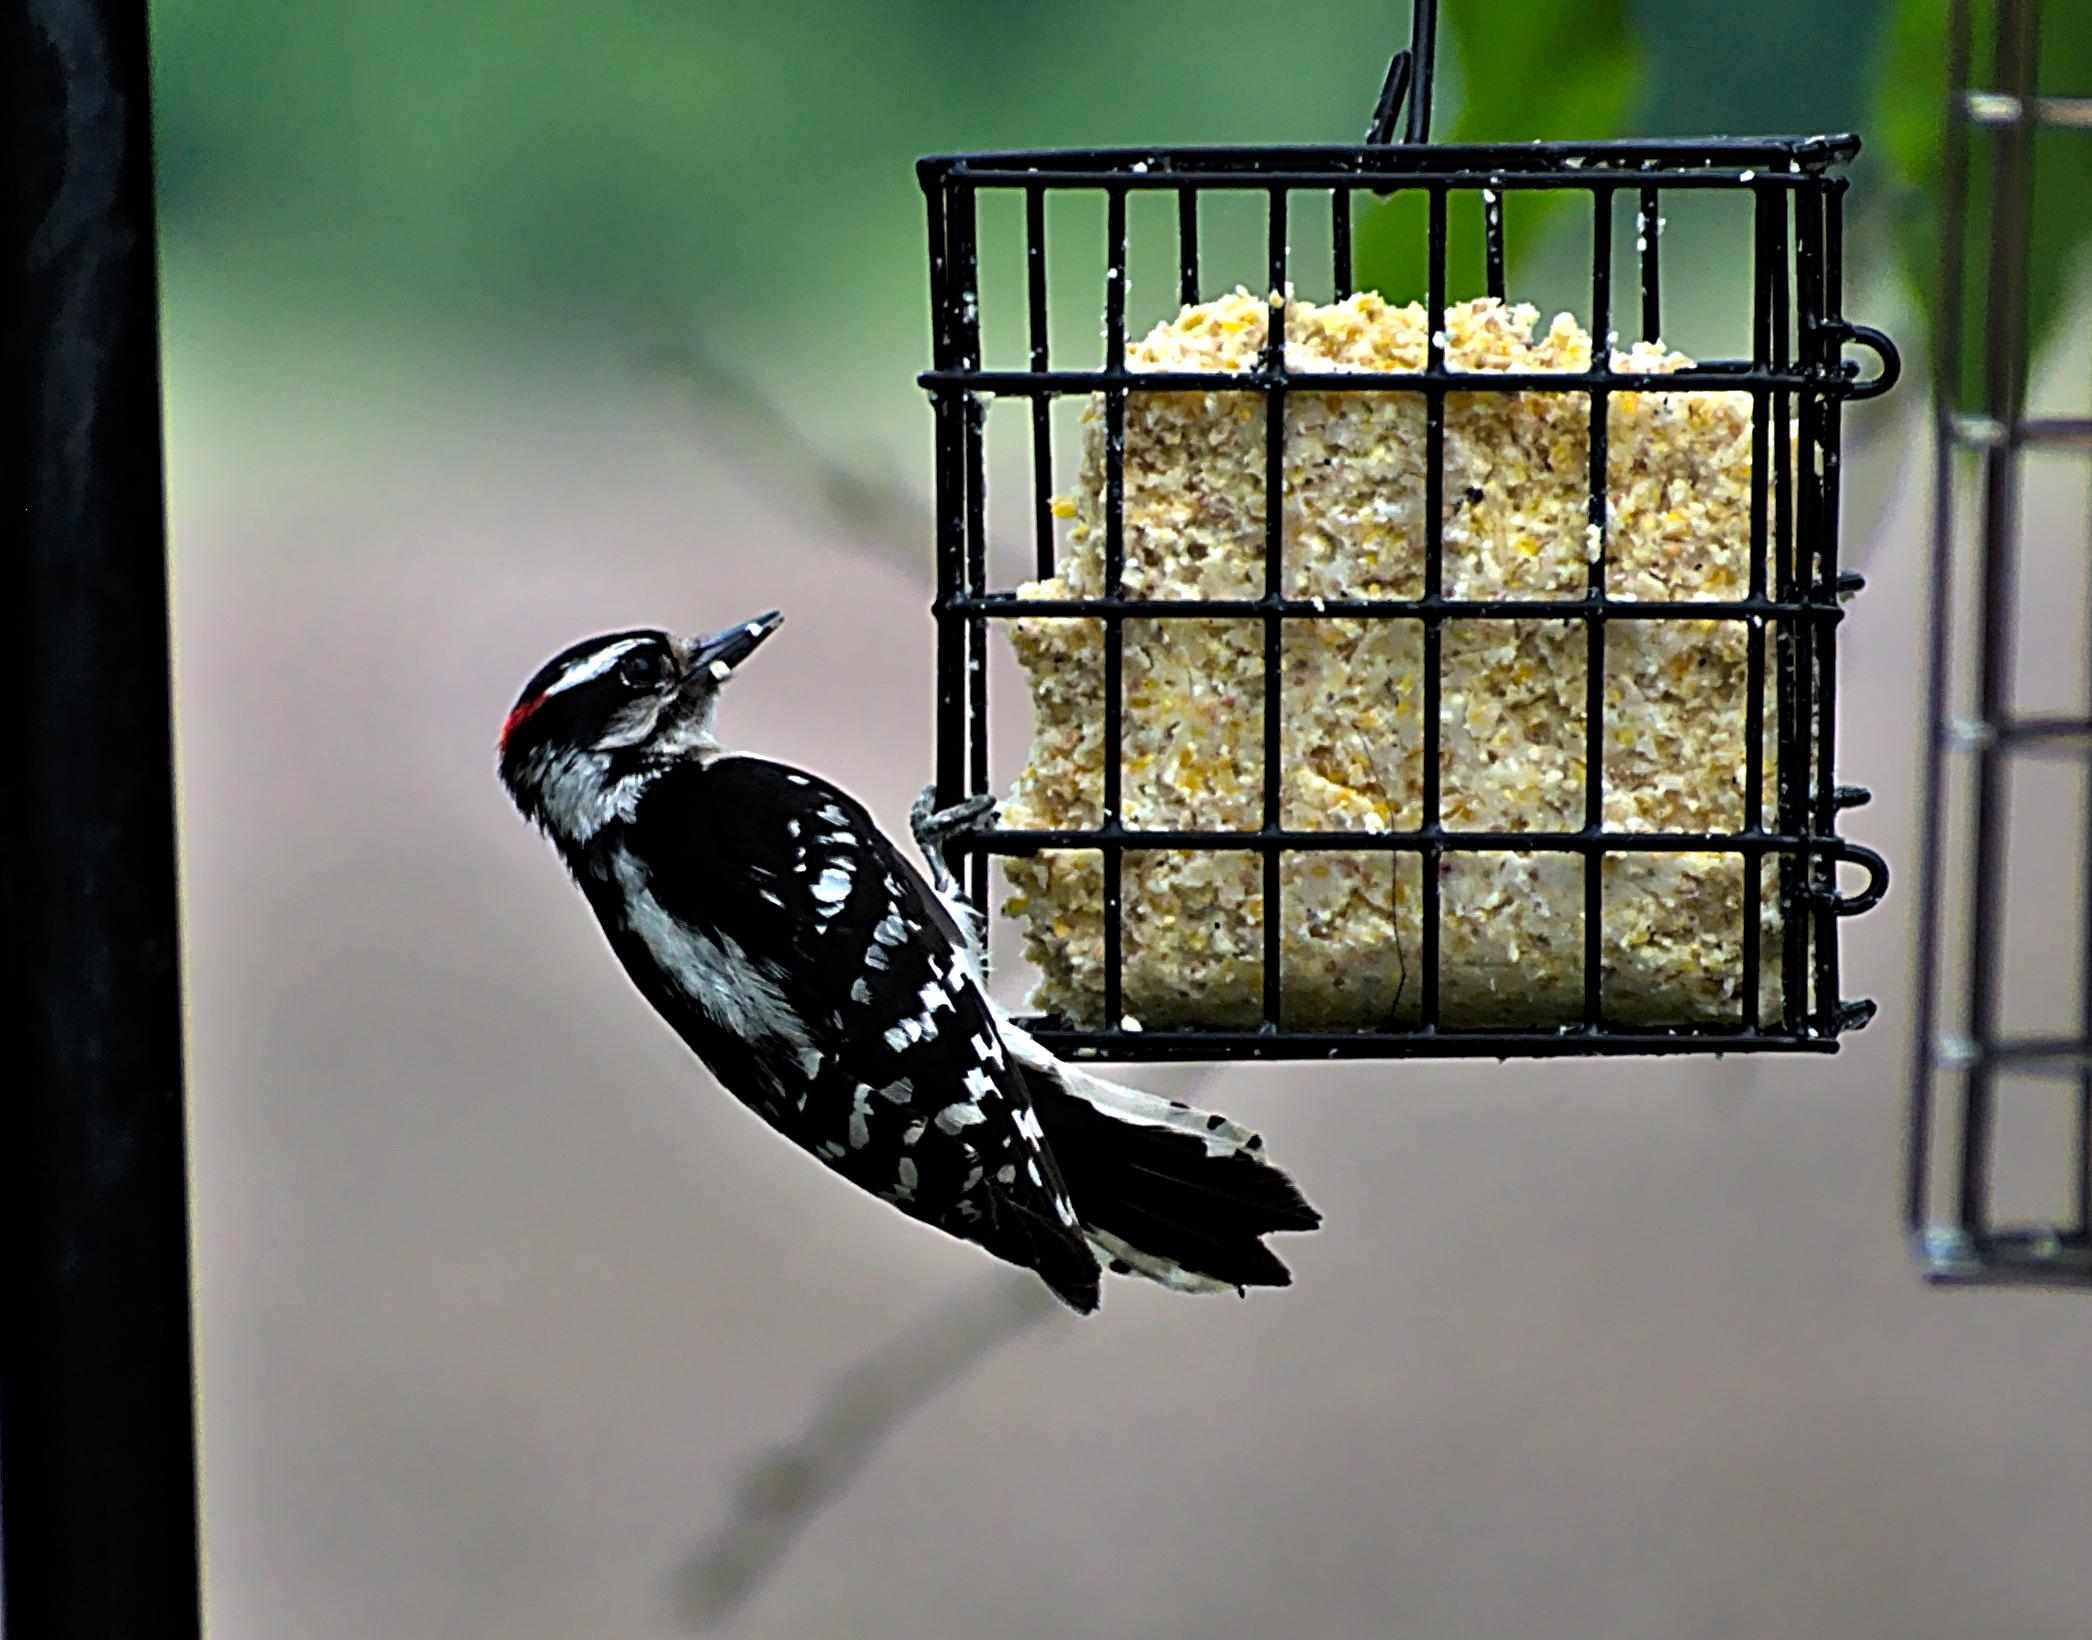 Male Downy Woodpecker Eating Suet